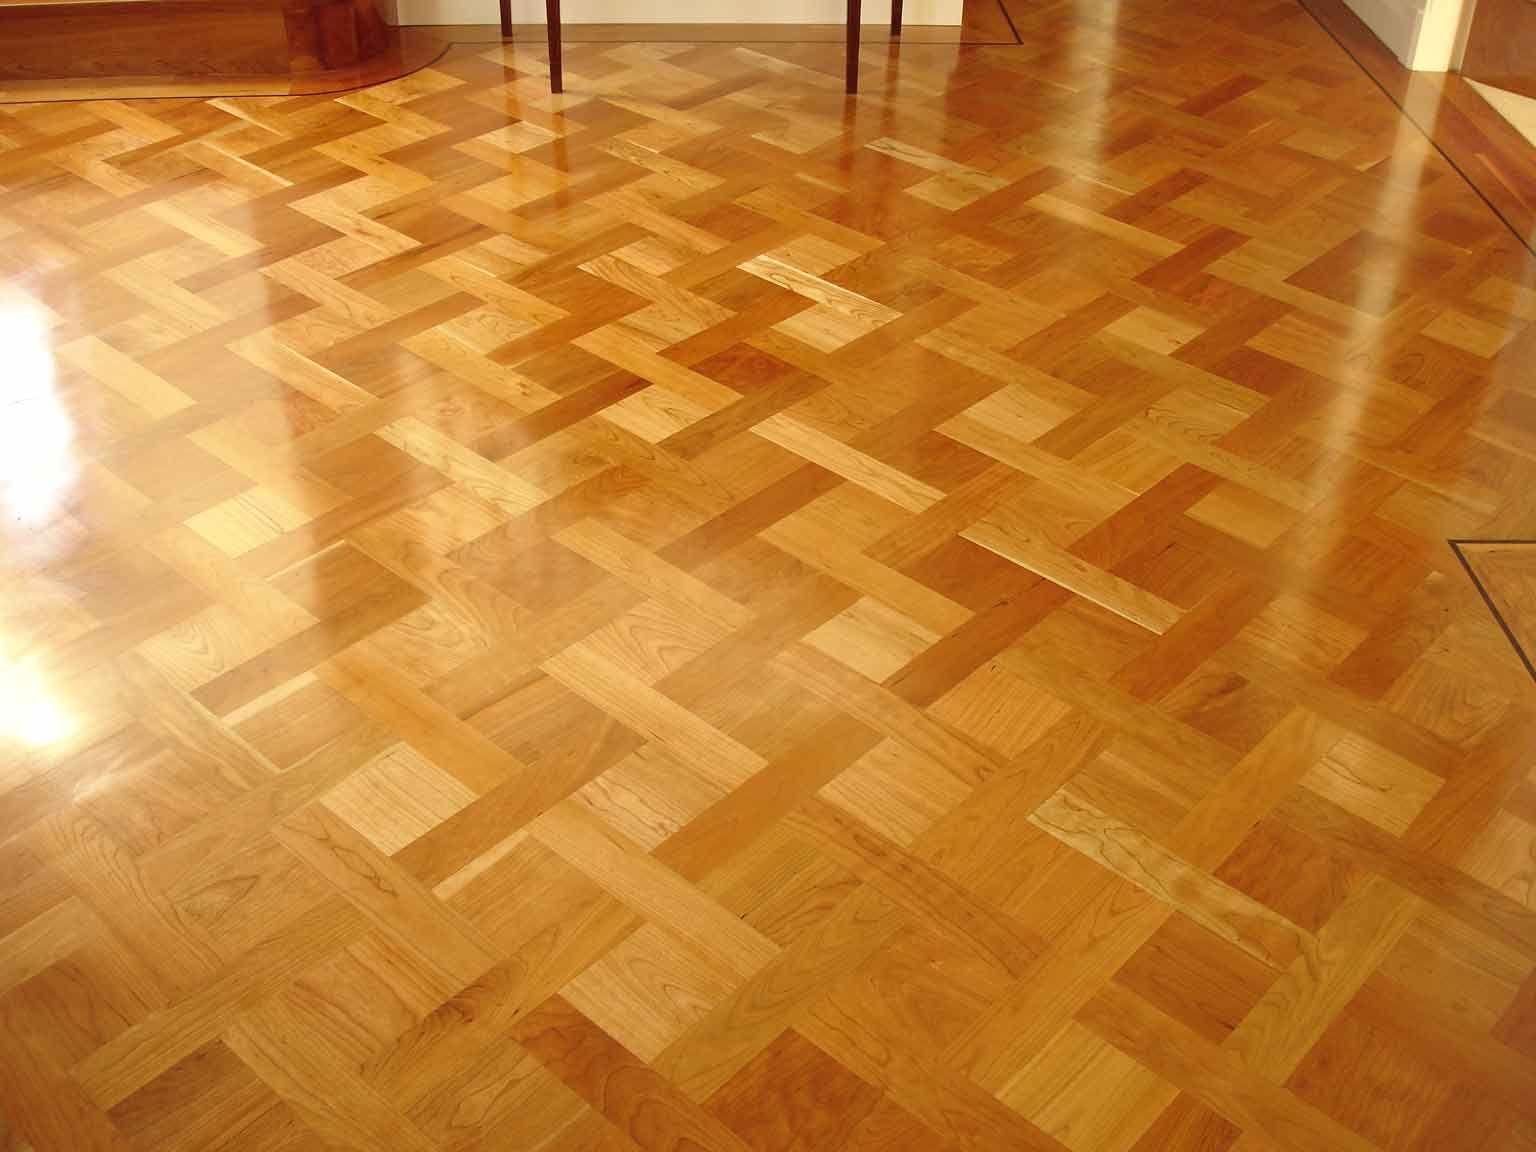 parquet wood flooring - clear hardwood parquet flooring VERAKSW